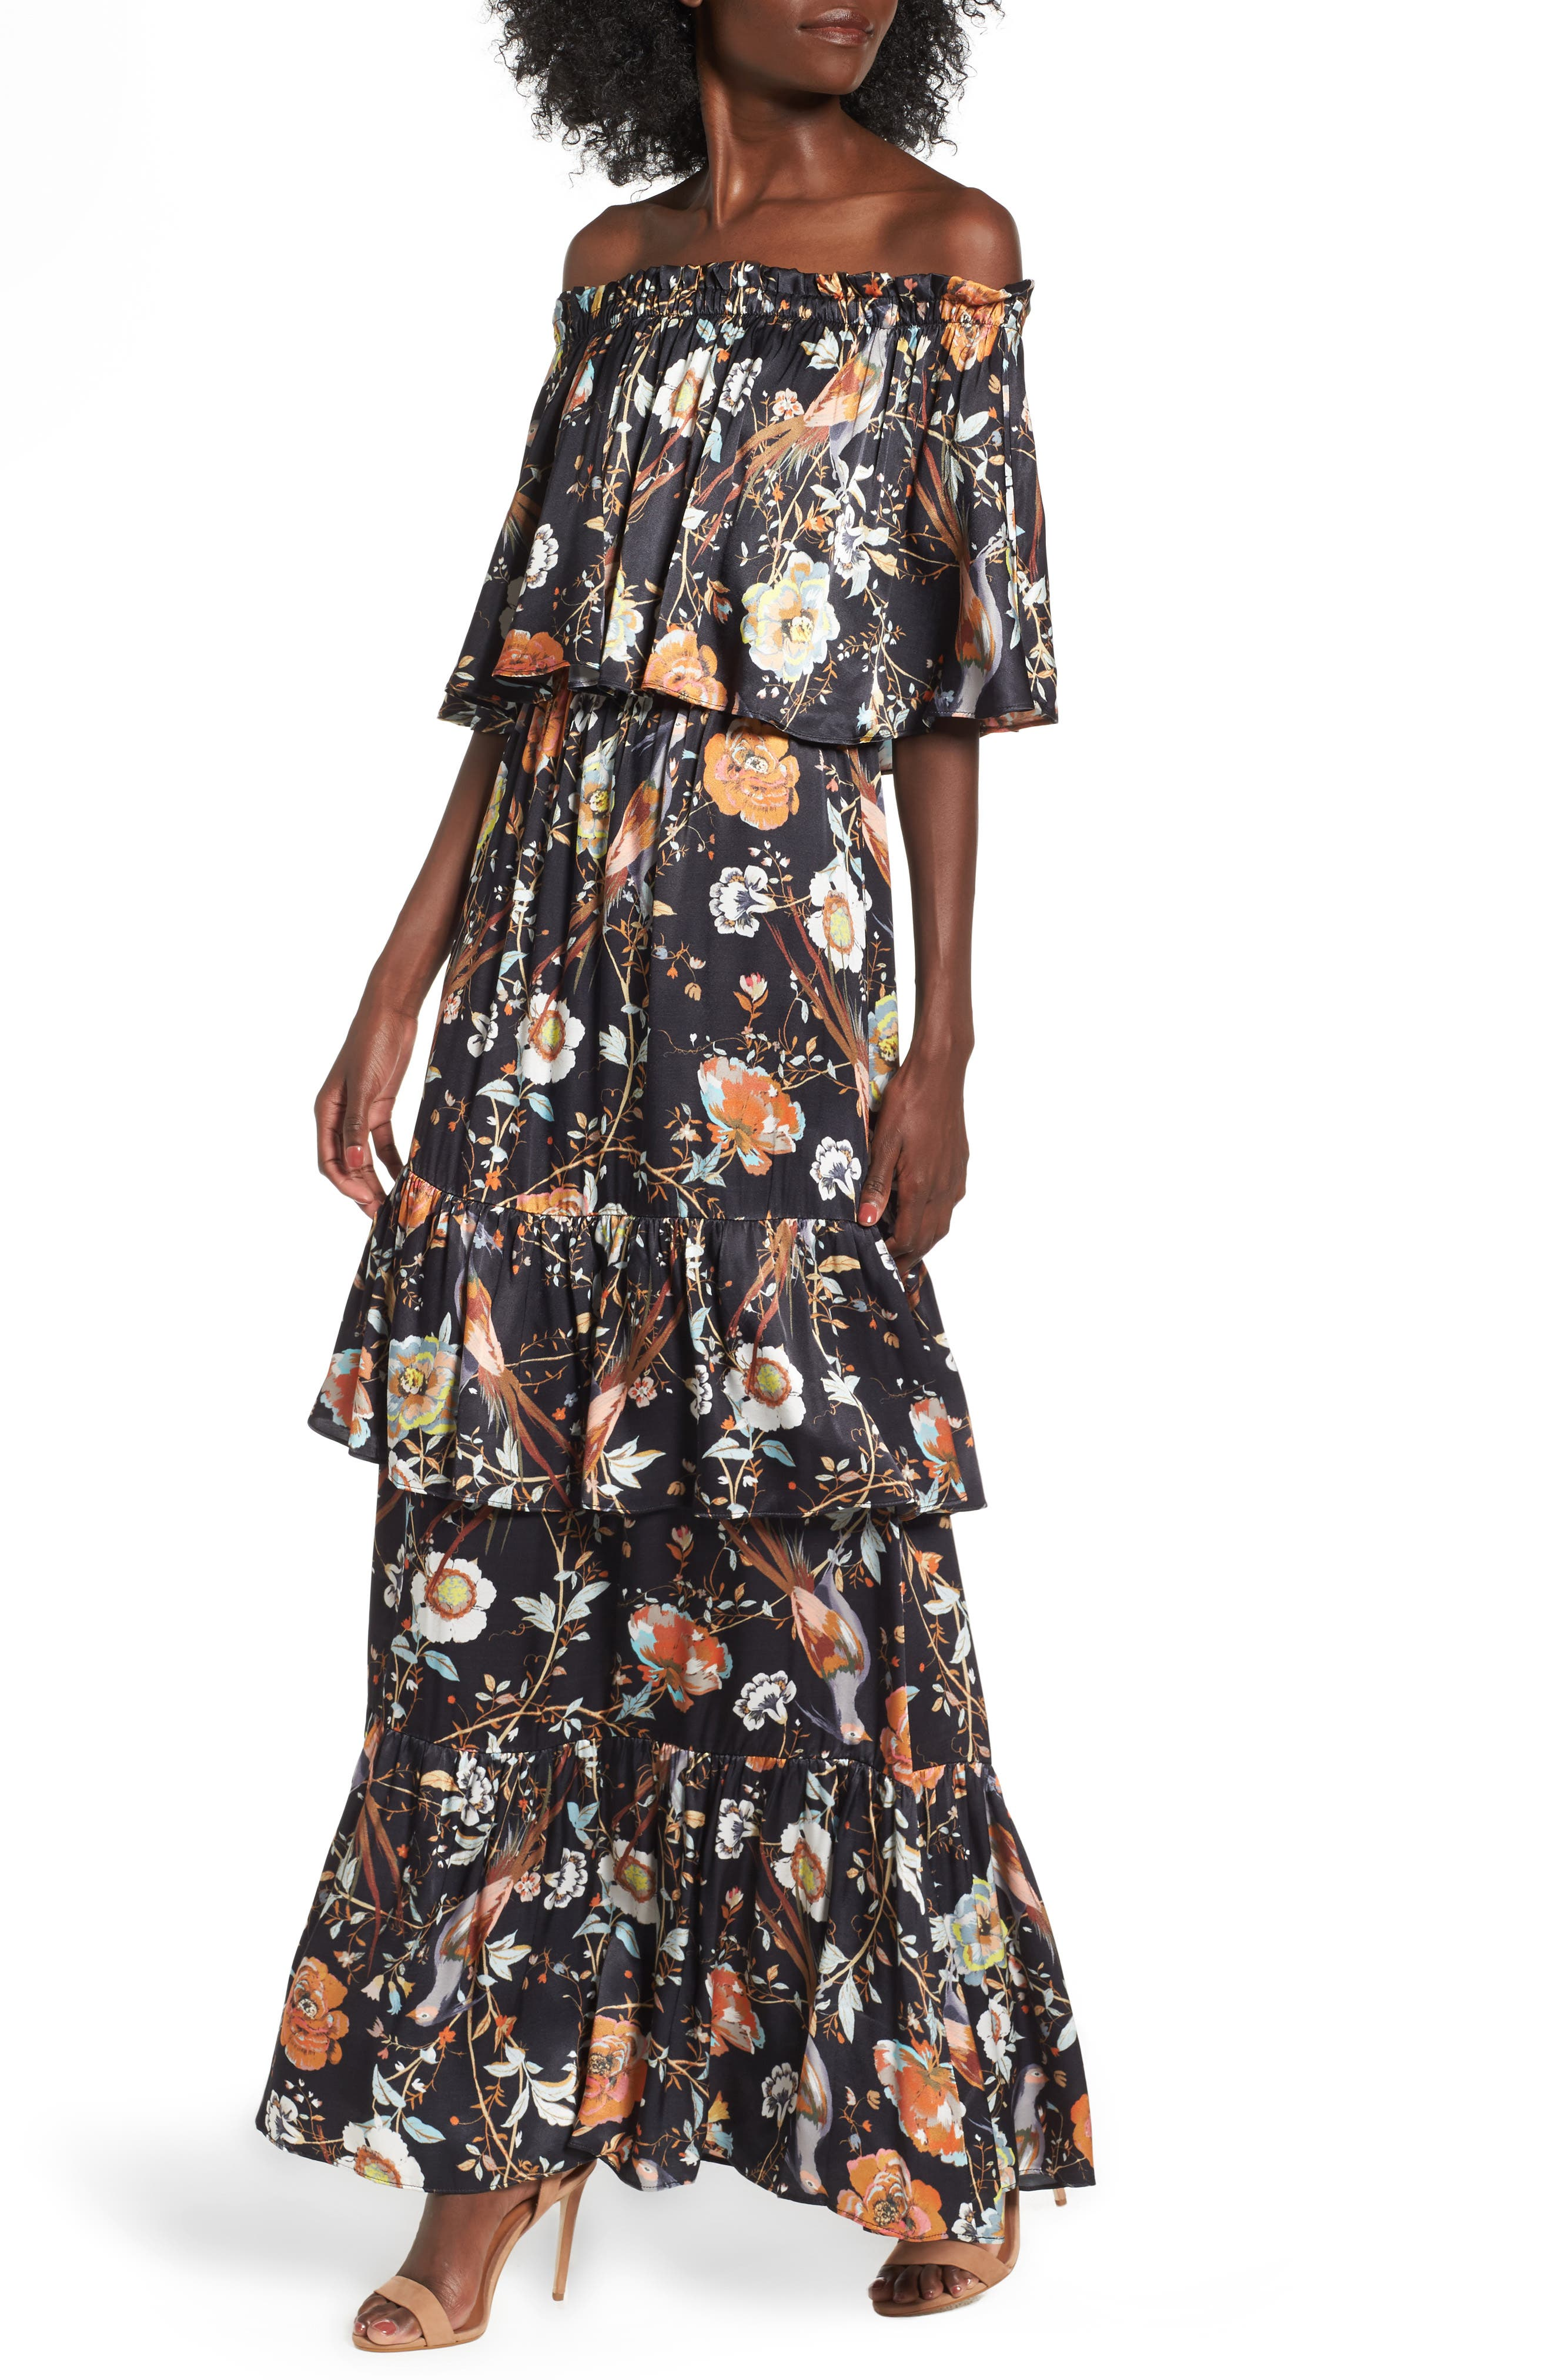 Main Image - AFRM Cleo Off the Shoulder Maxi Dress